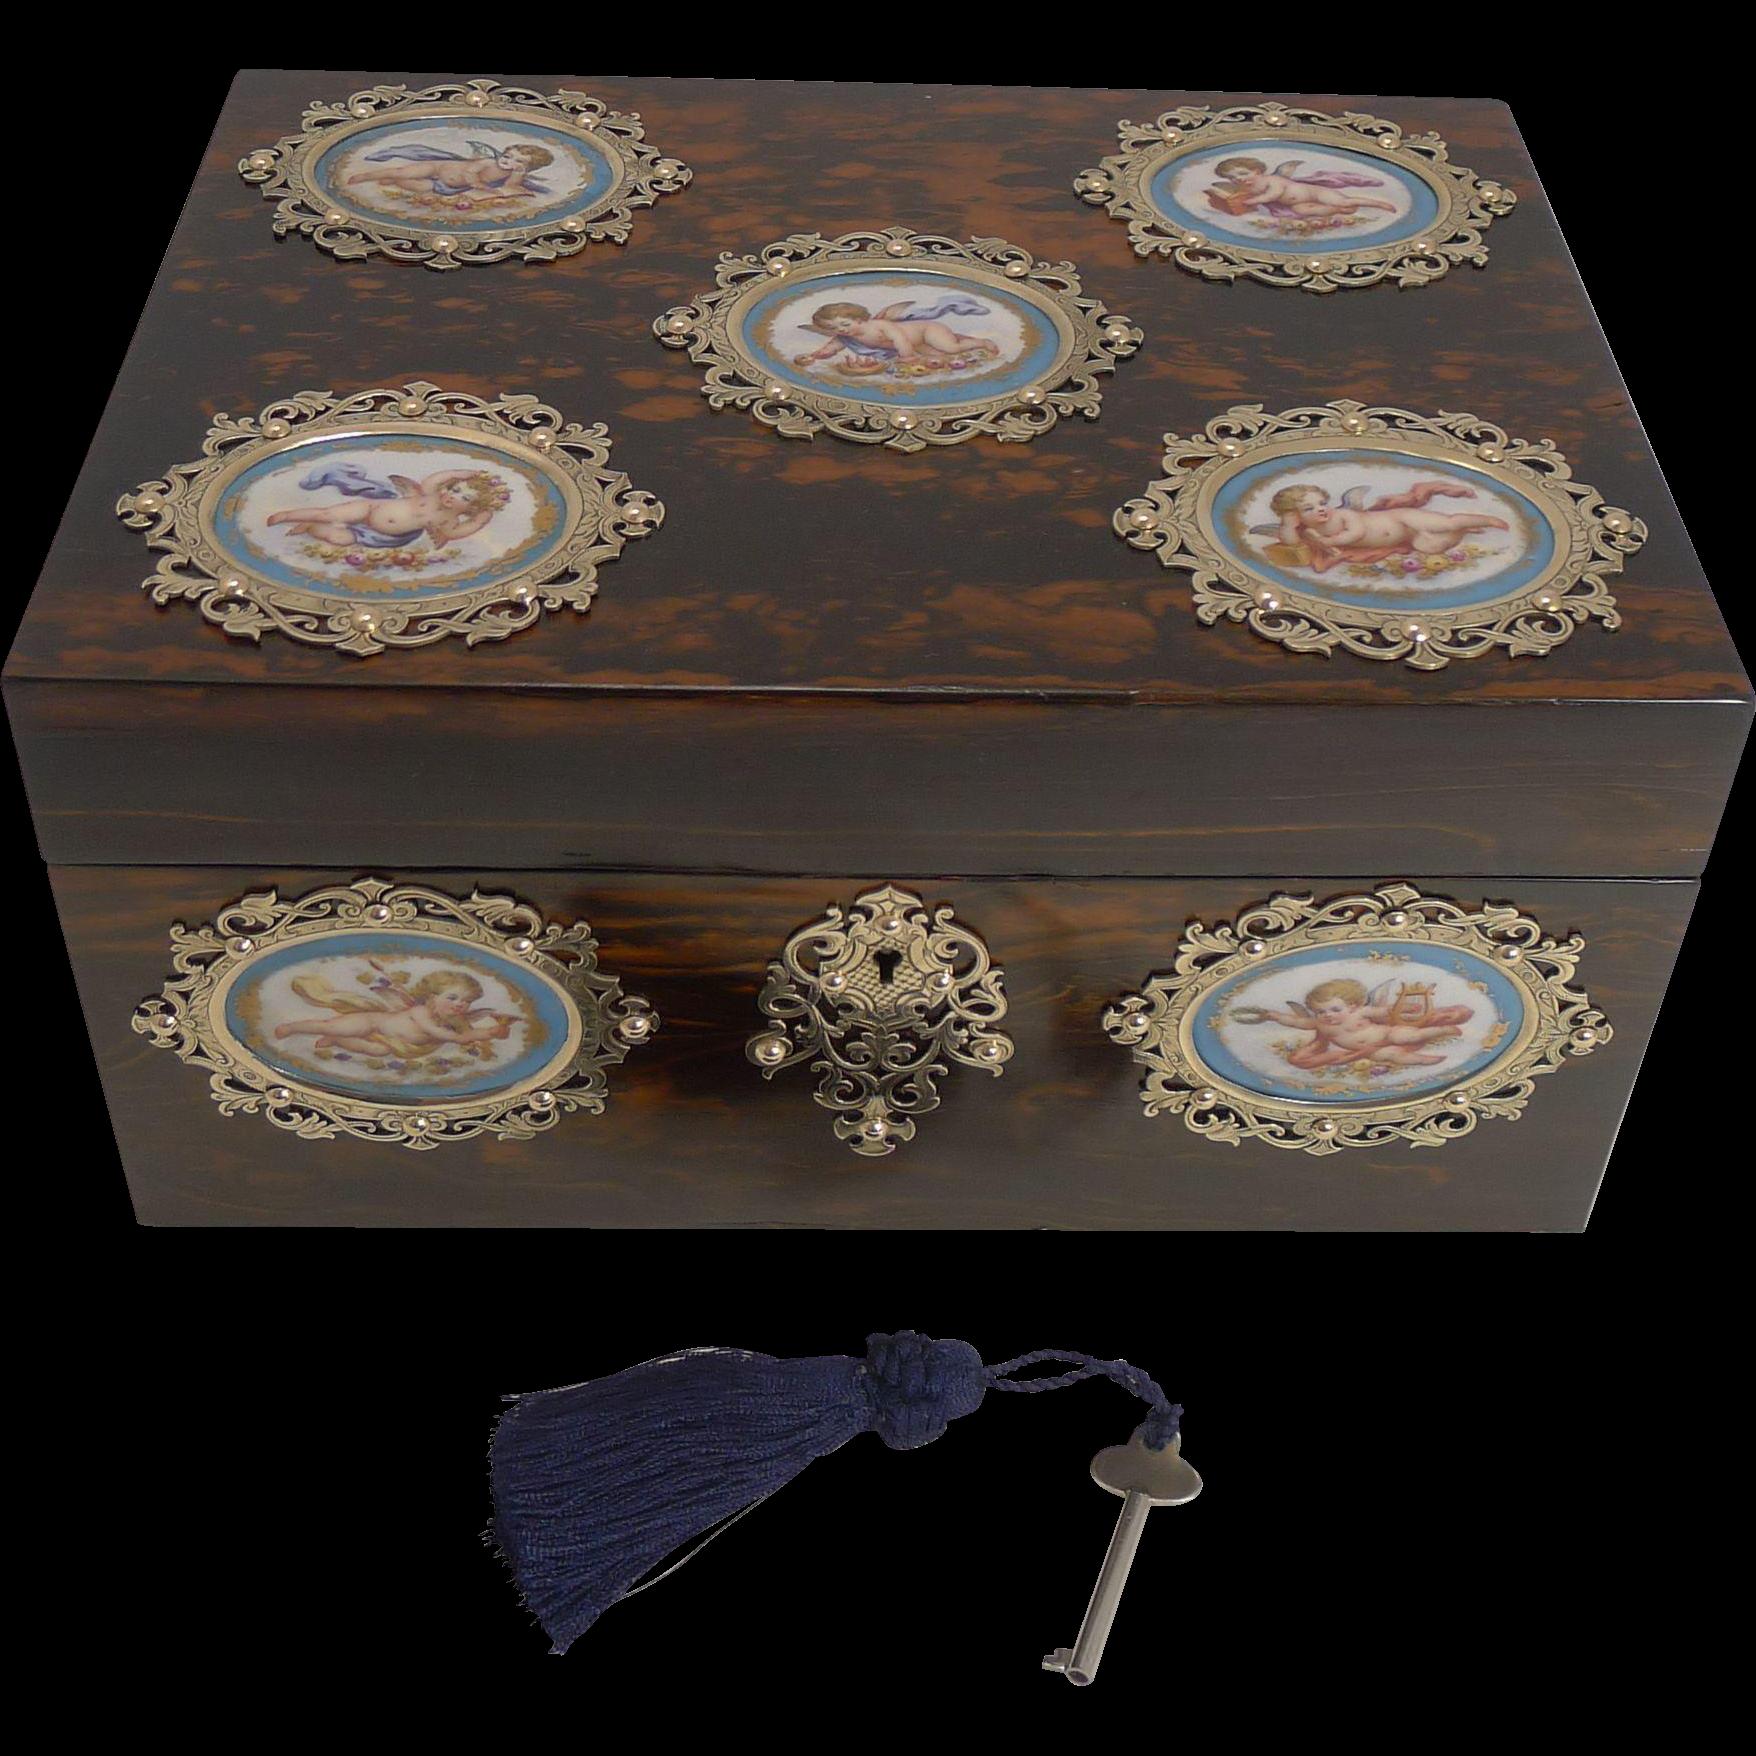 Grandest Antique English Coromandel Jewelry Box - Hand Painted Cherub Porcelain Plaques c.1850